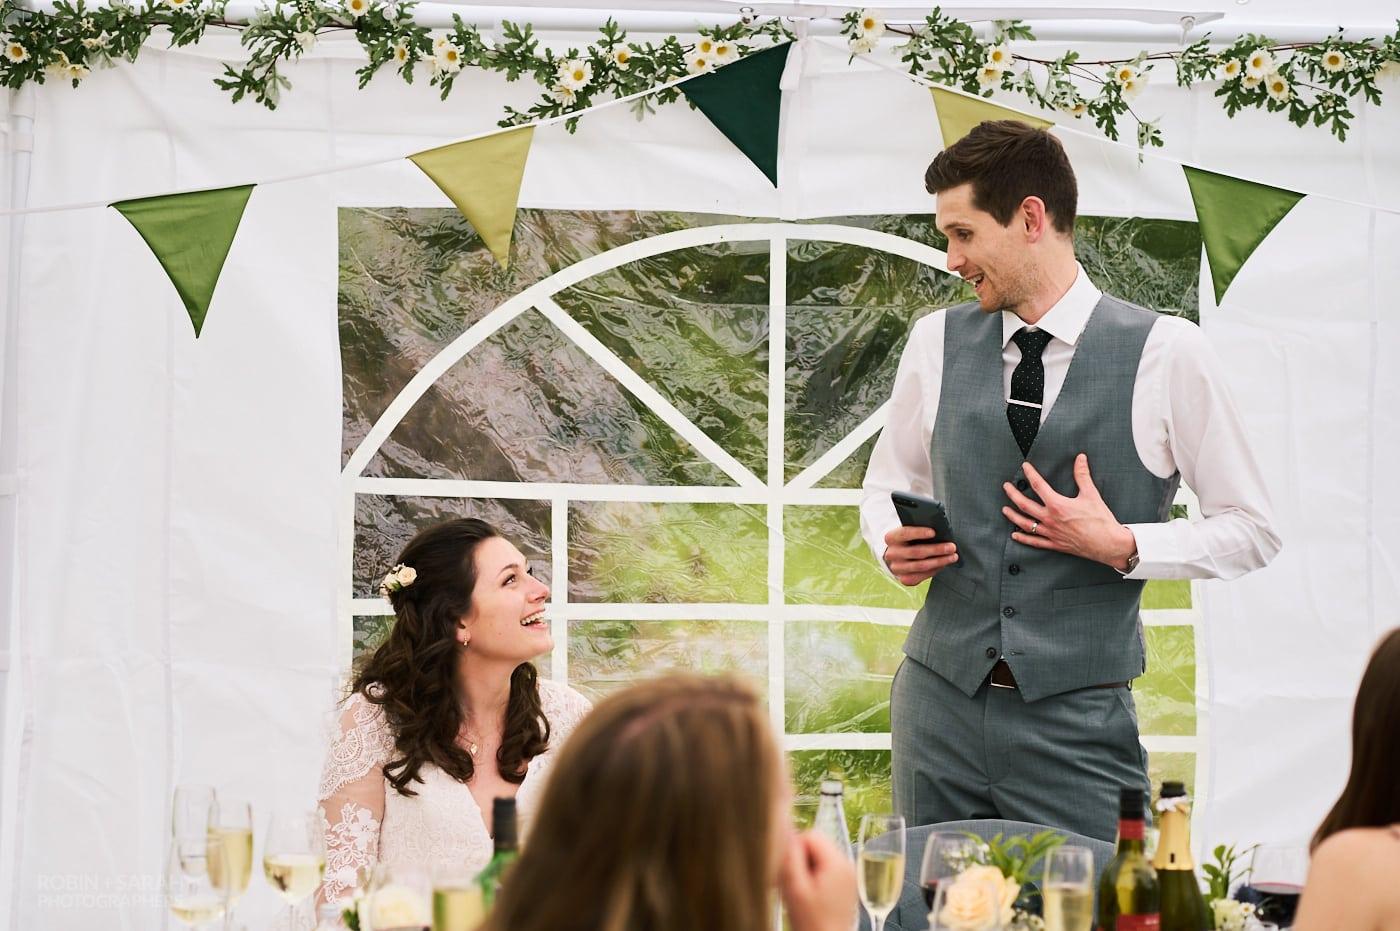 Groom delivers speech at small garden wedding